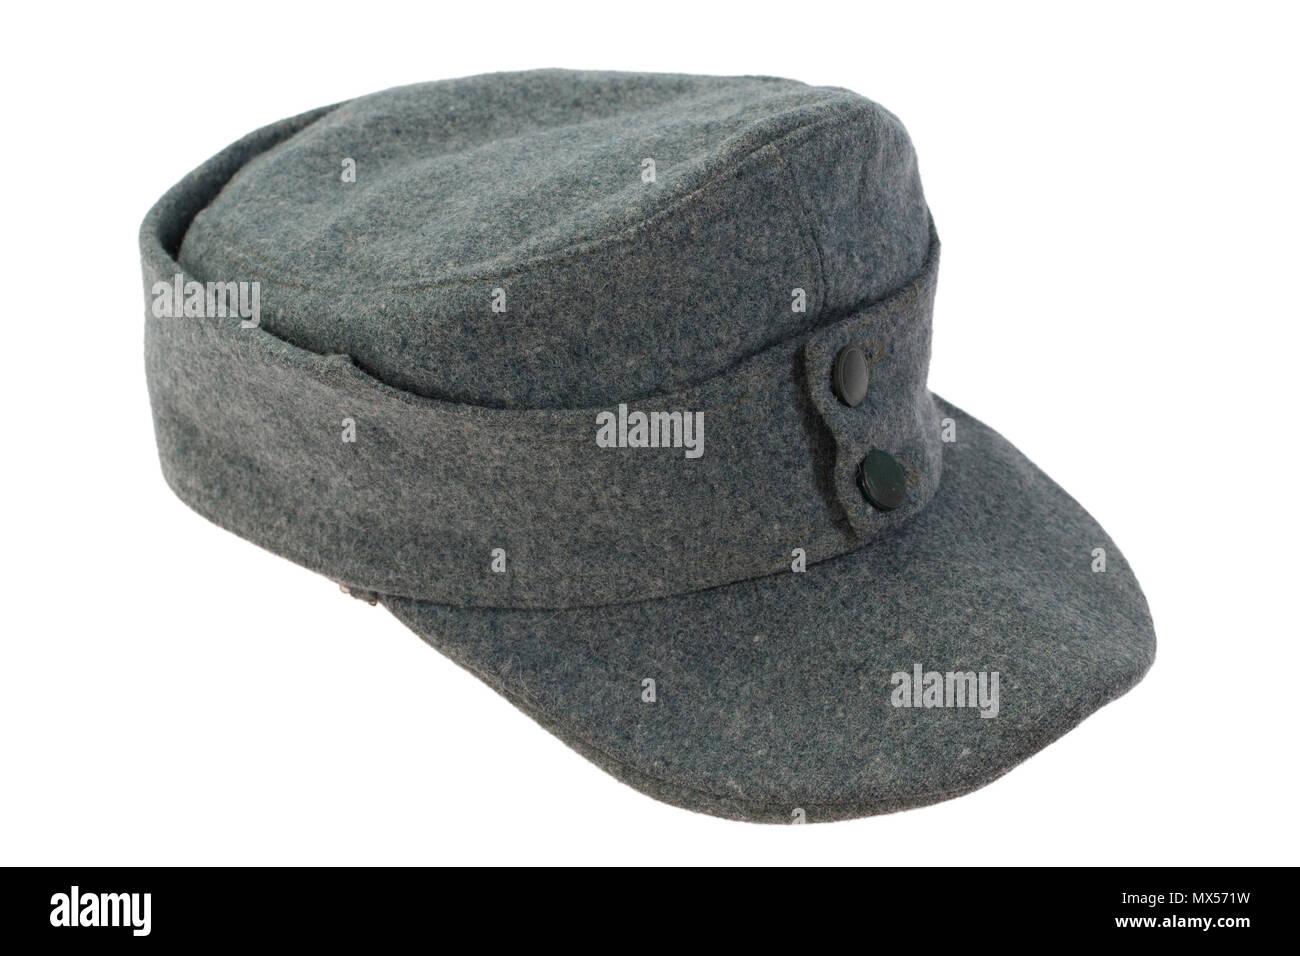 8337af6c6f0 German Army field cap (kepi) World War II period isolated on a white  background